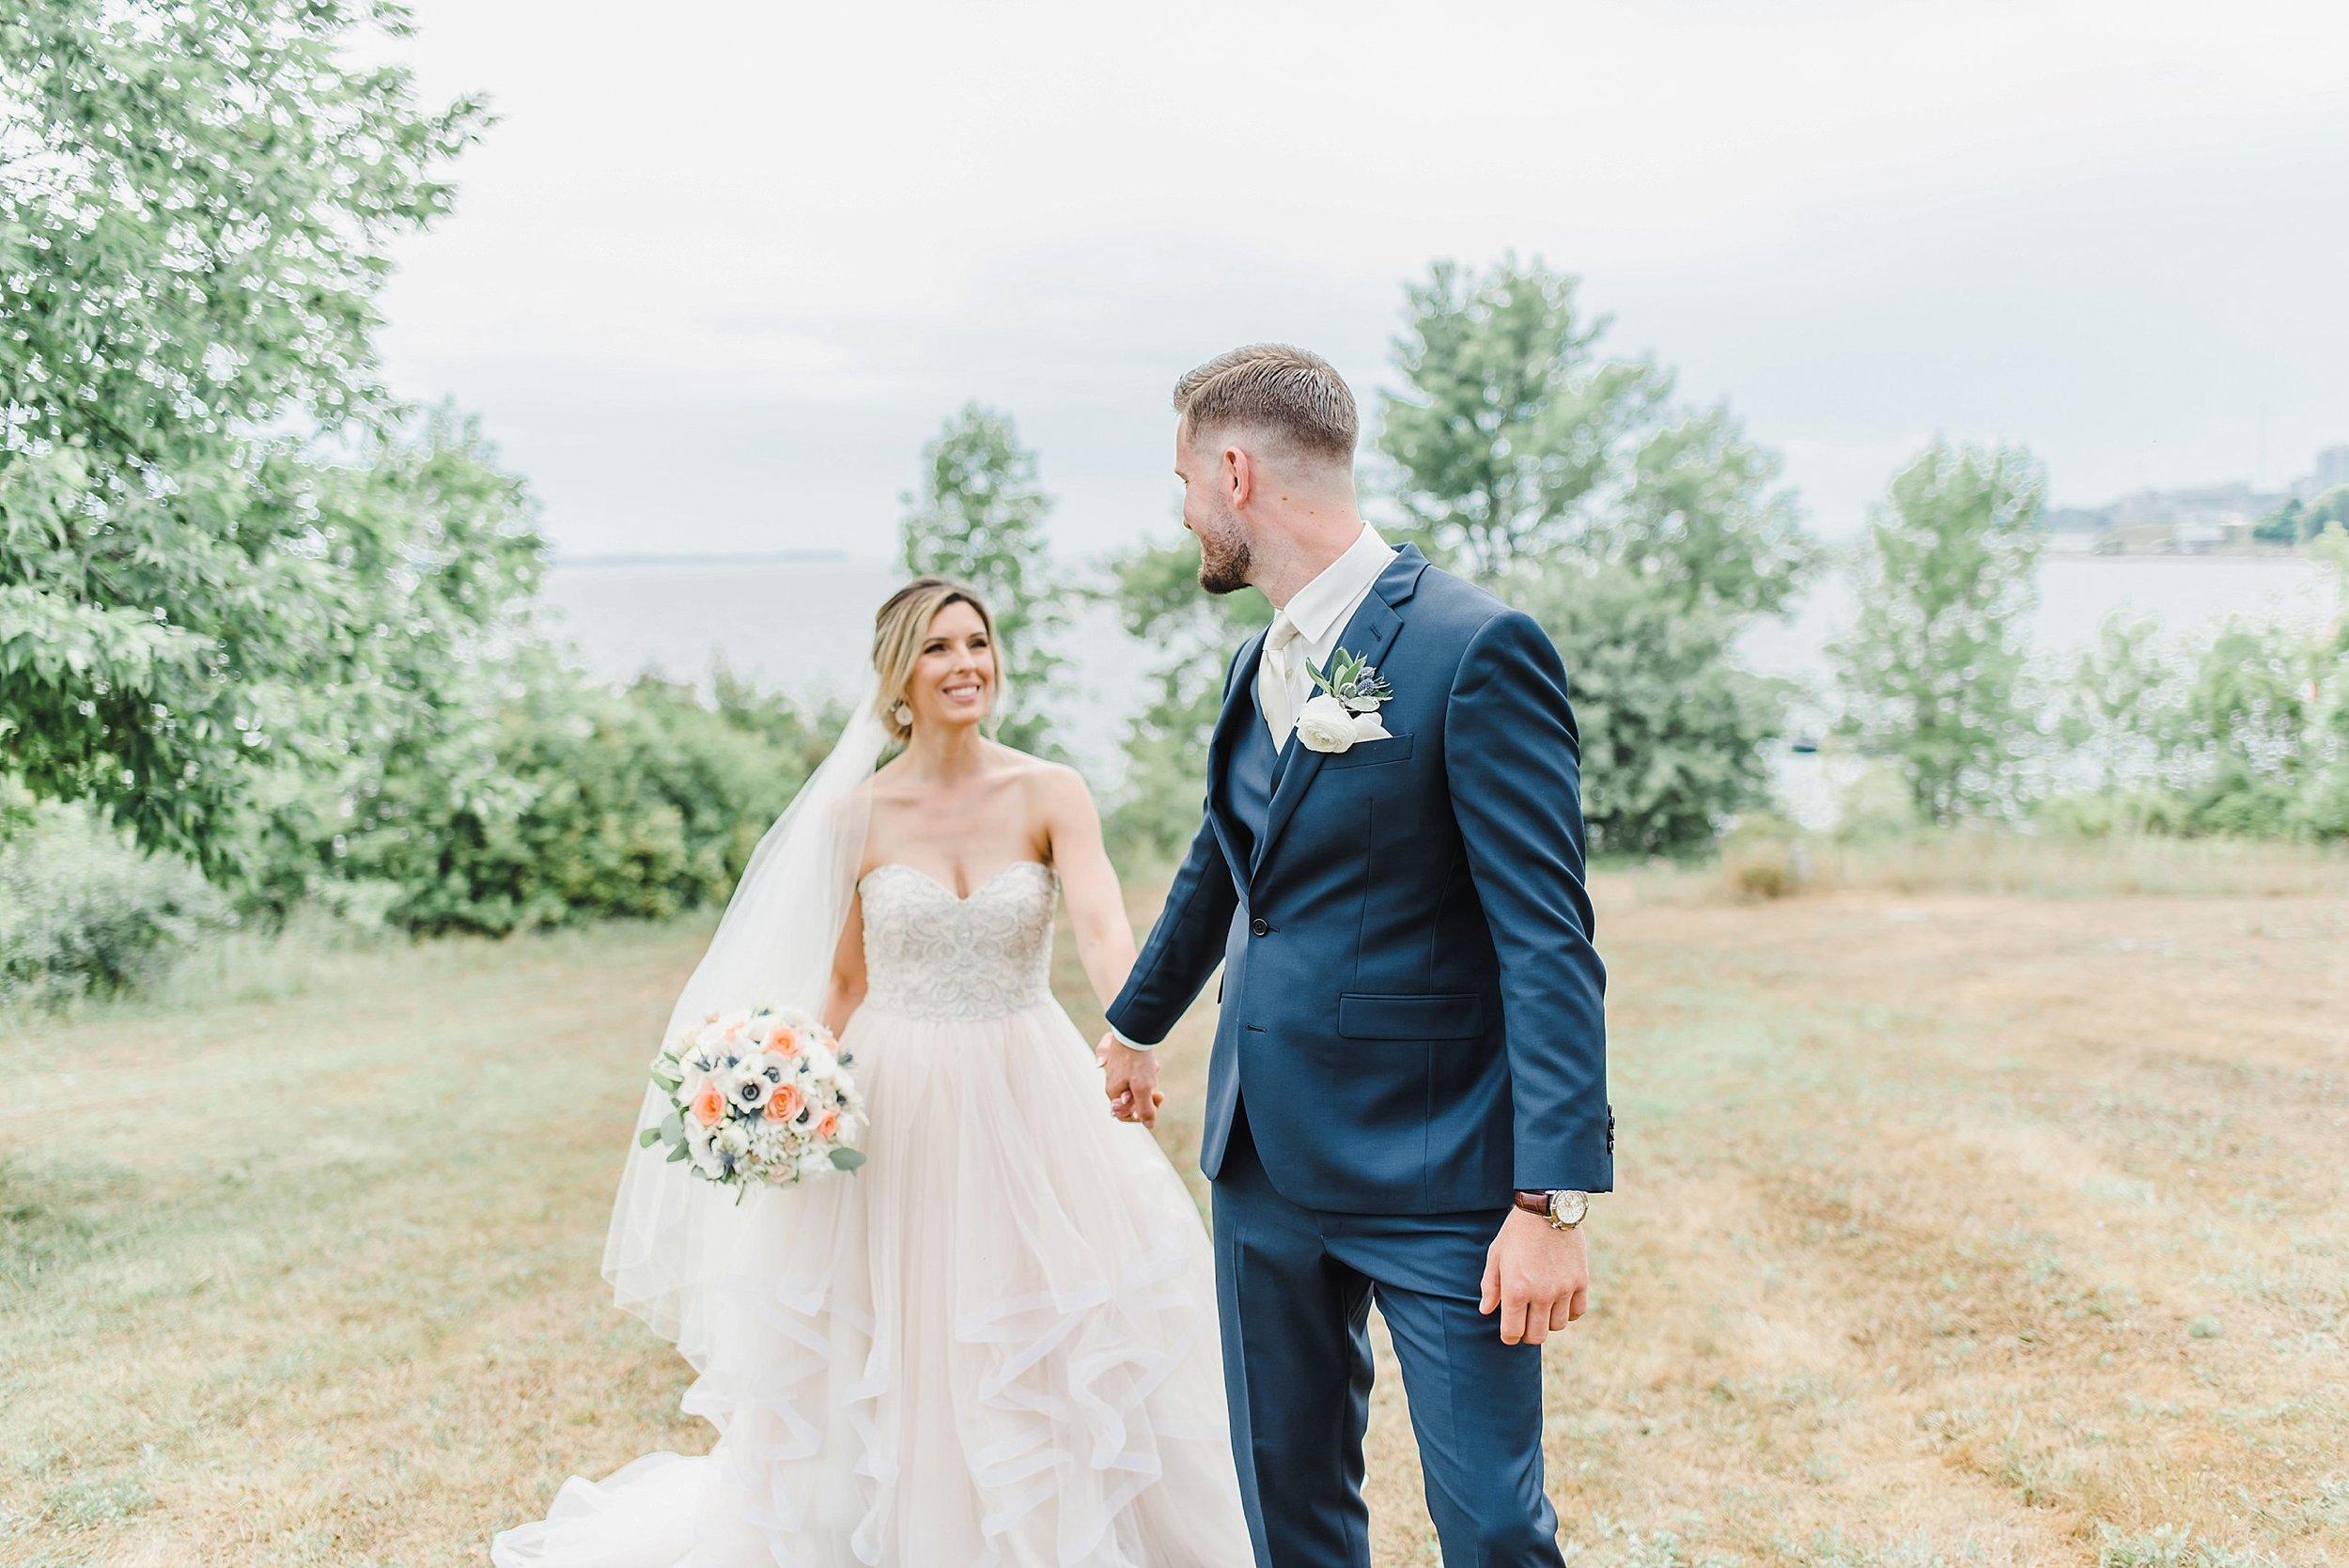 light airy indie fine art ottawa wedding photographer | Ali and Batoul Photography_0161.jpg